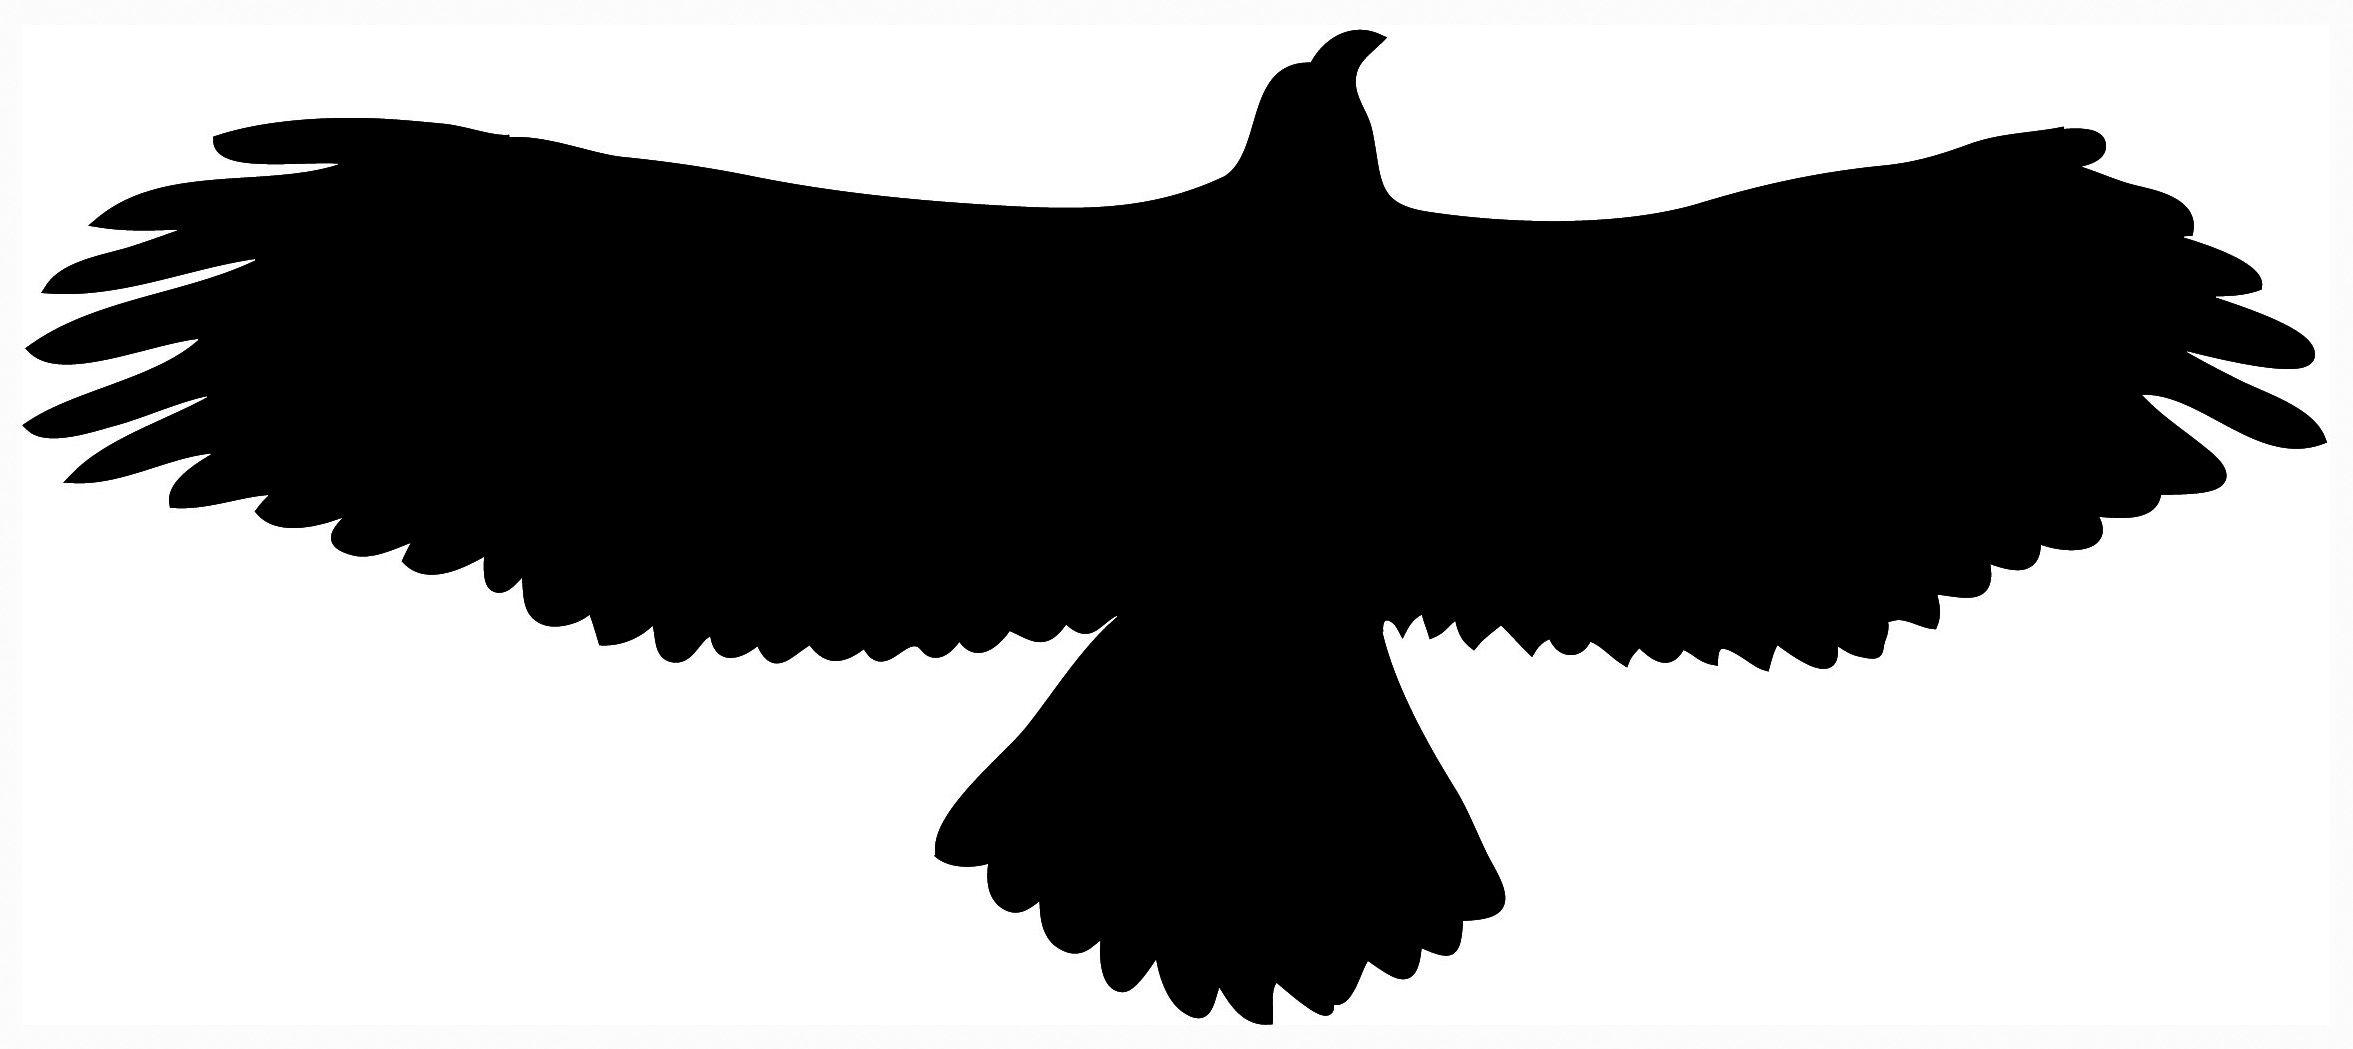 2353x1049 Eagle Silhouette